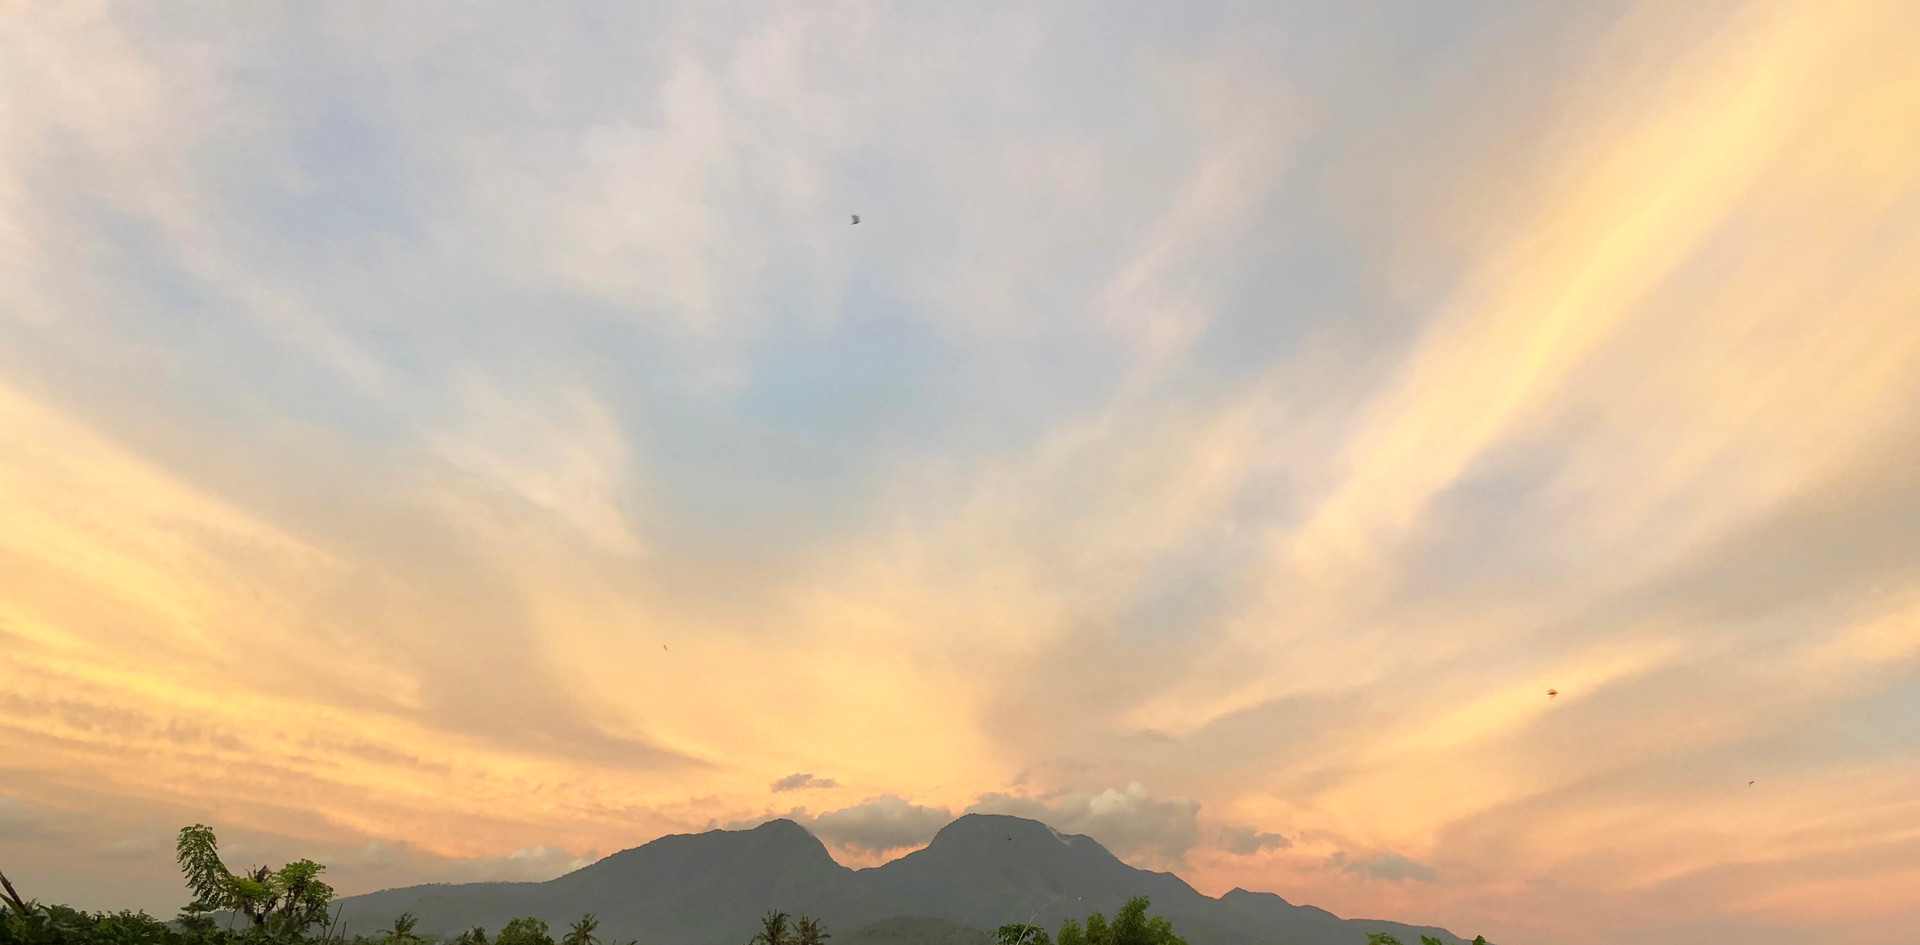 Seraya Mountains/Lempuyang temple